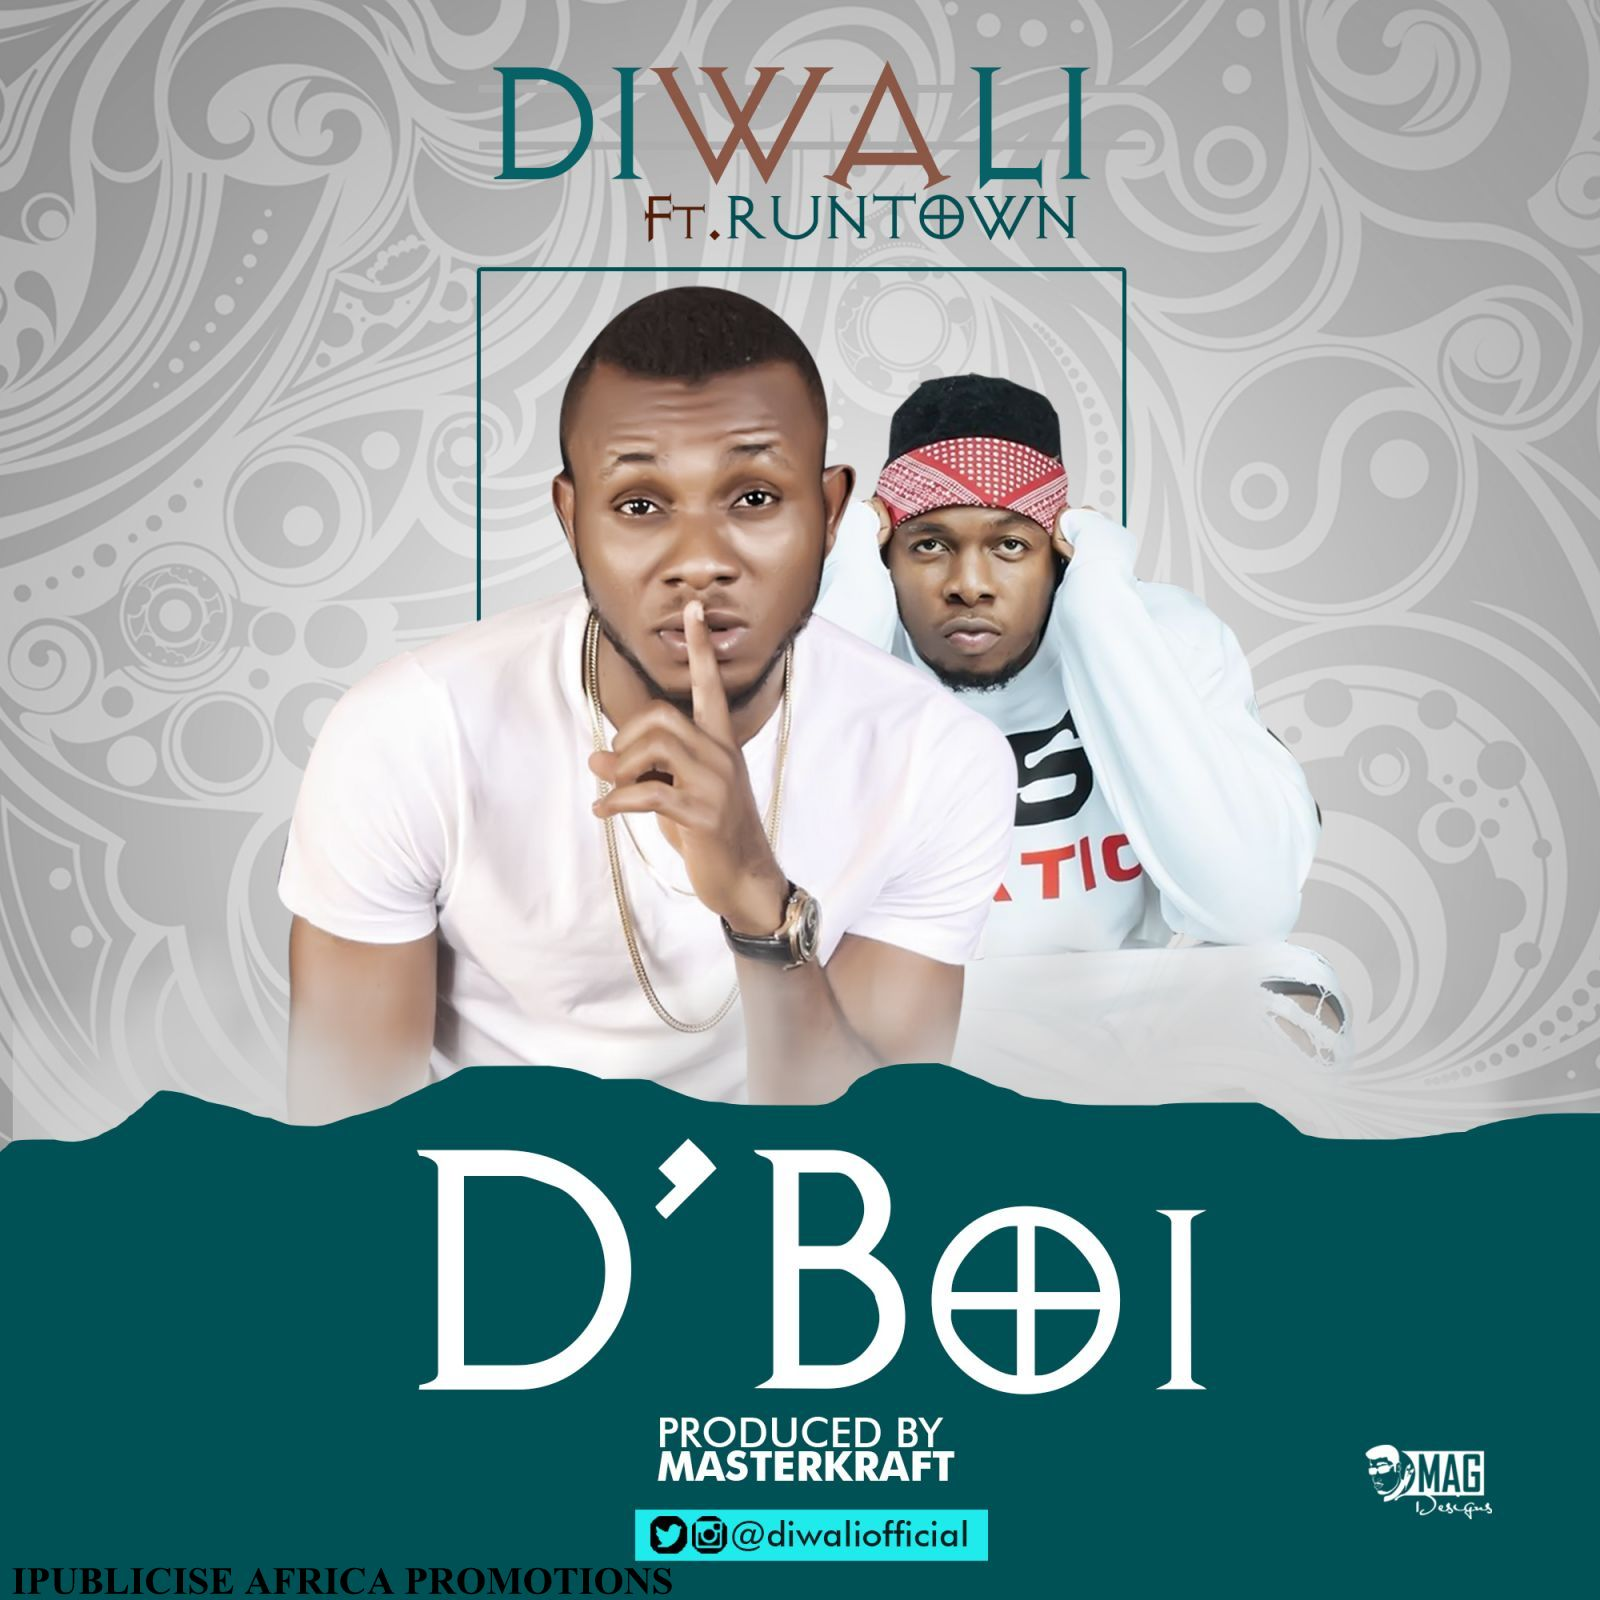 Diwali ft. Runtown - D'Boi (Prod. Masterkraft)